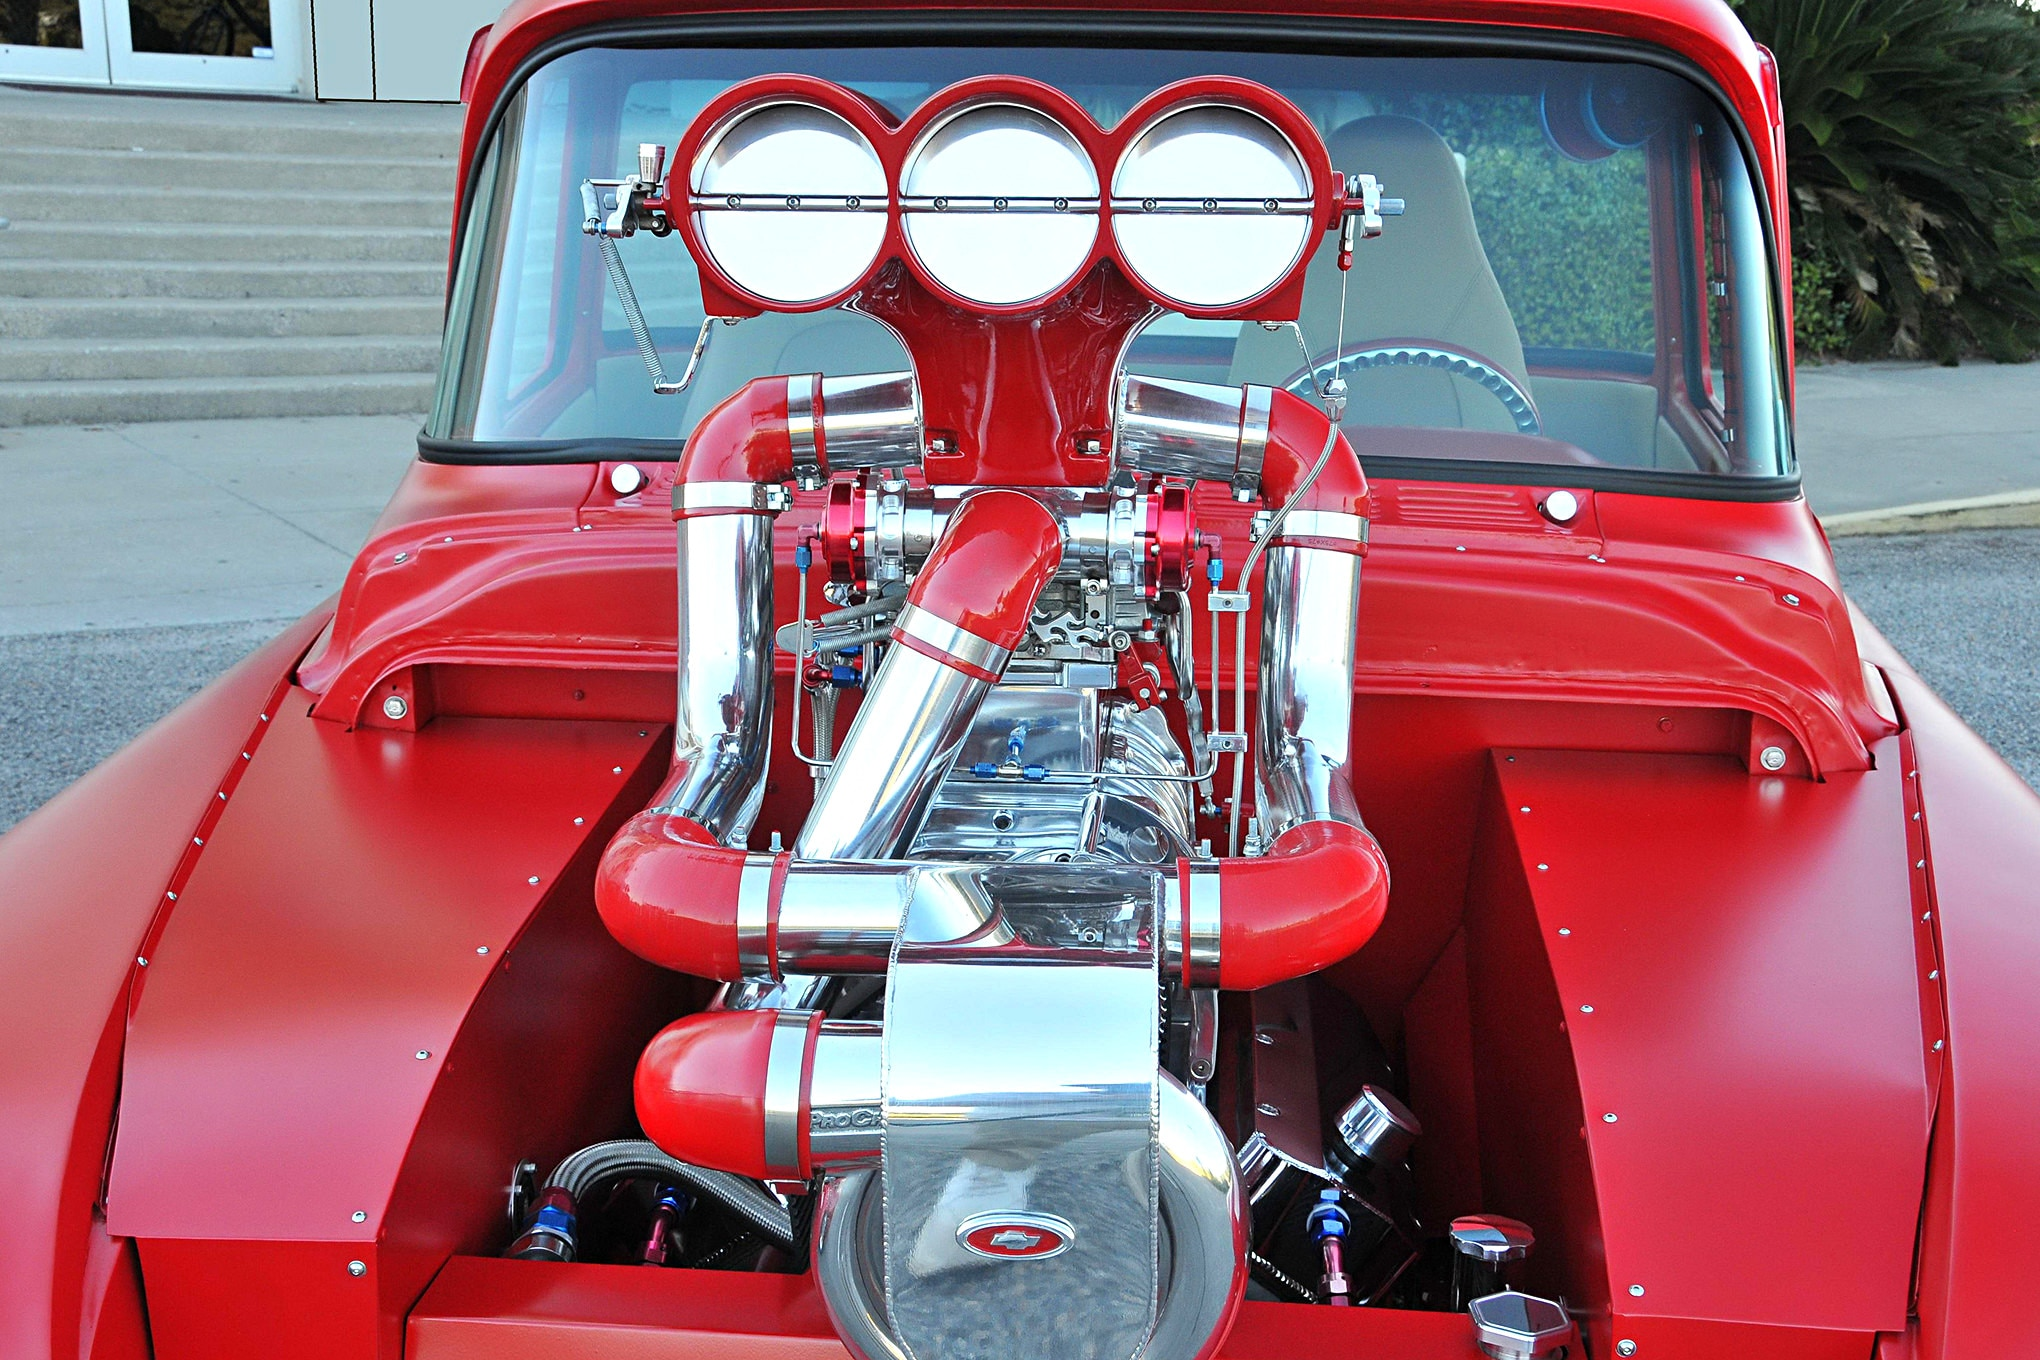 014-blower-mafia-supercharger-turbo-brad